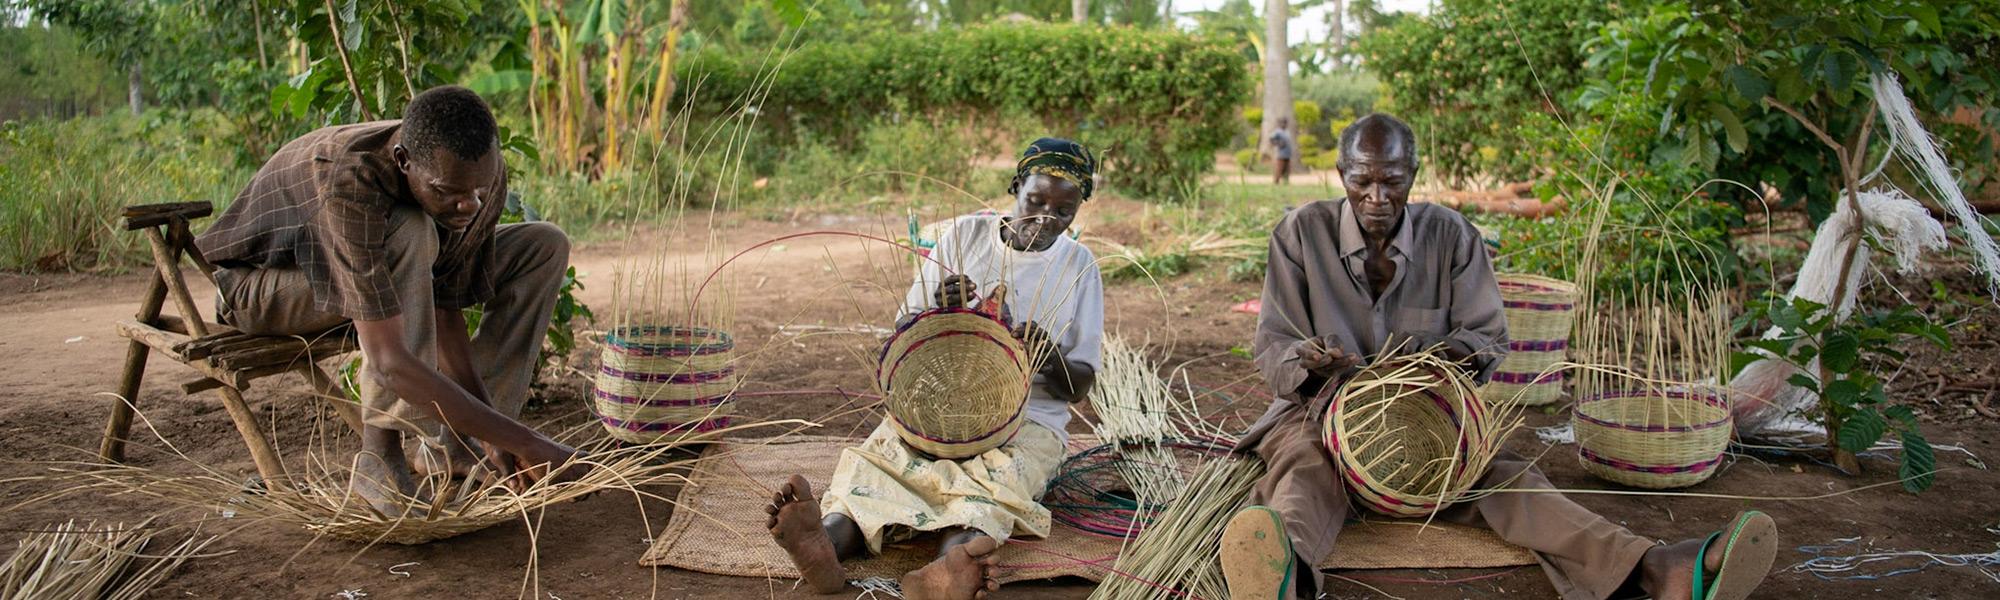 People making baskets